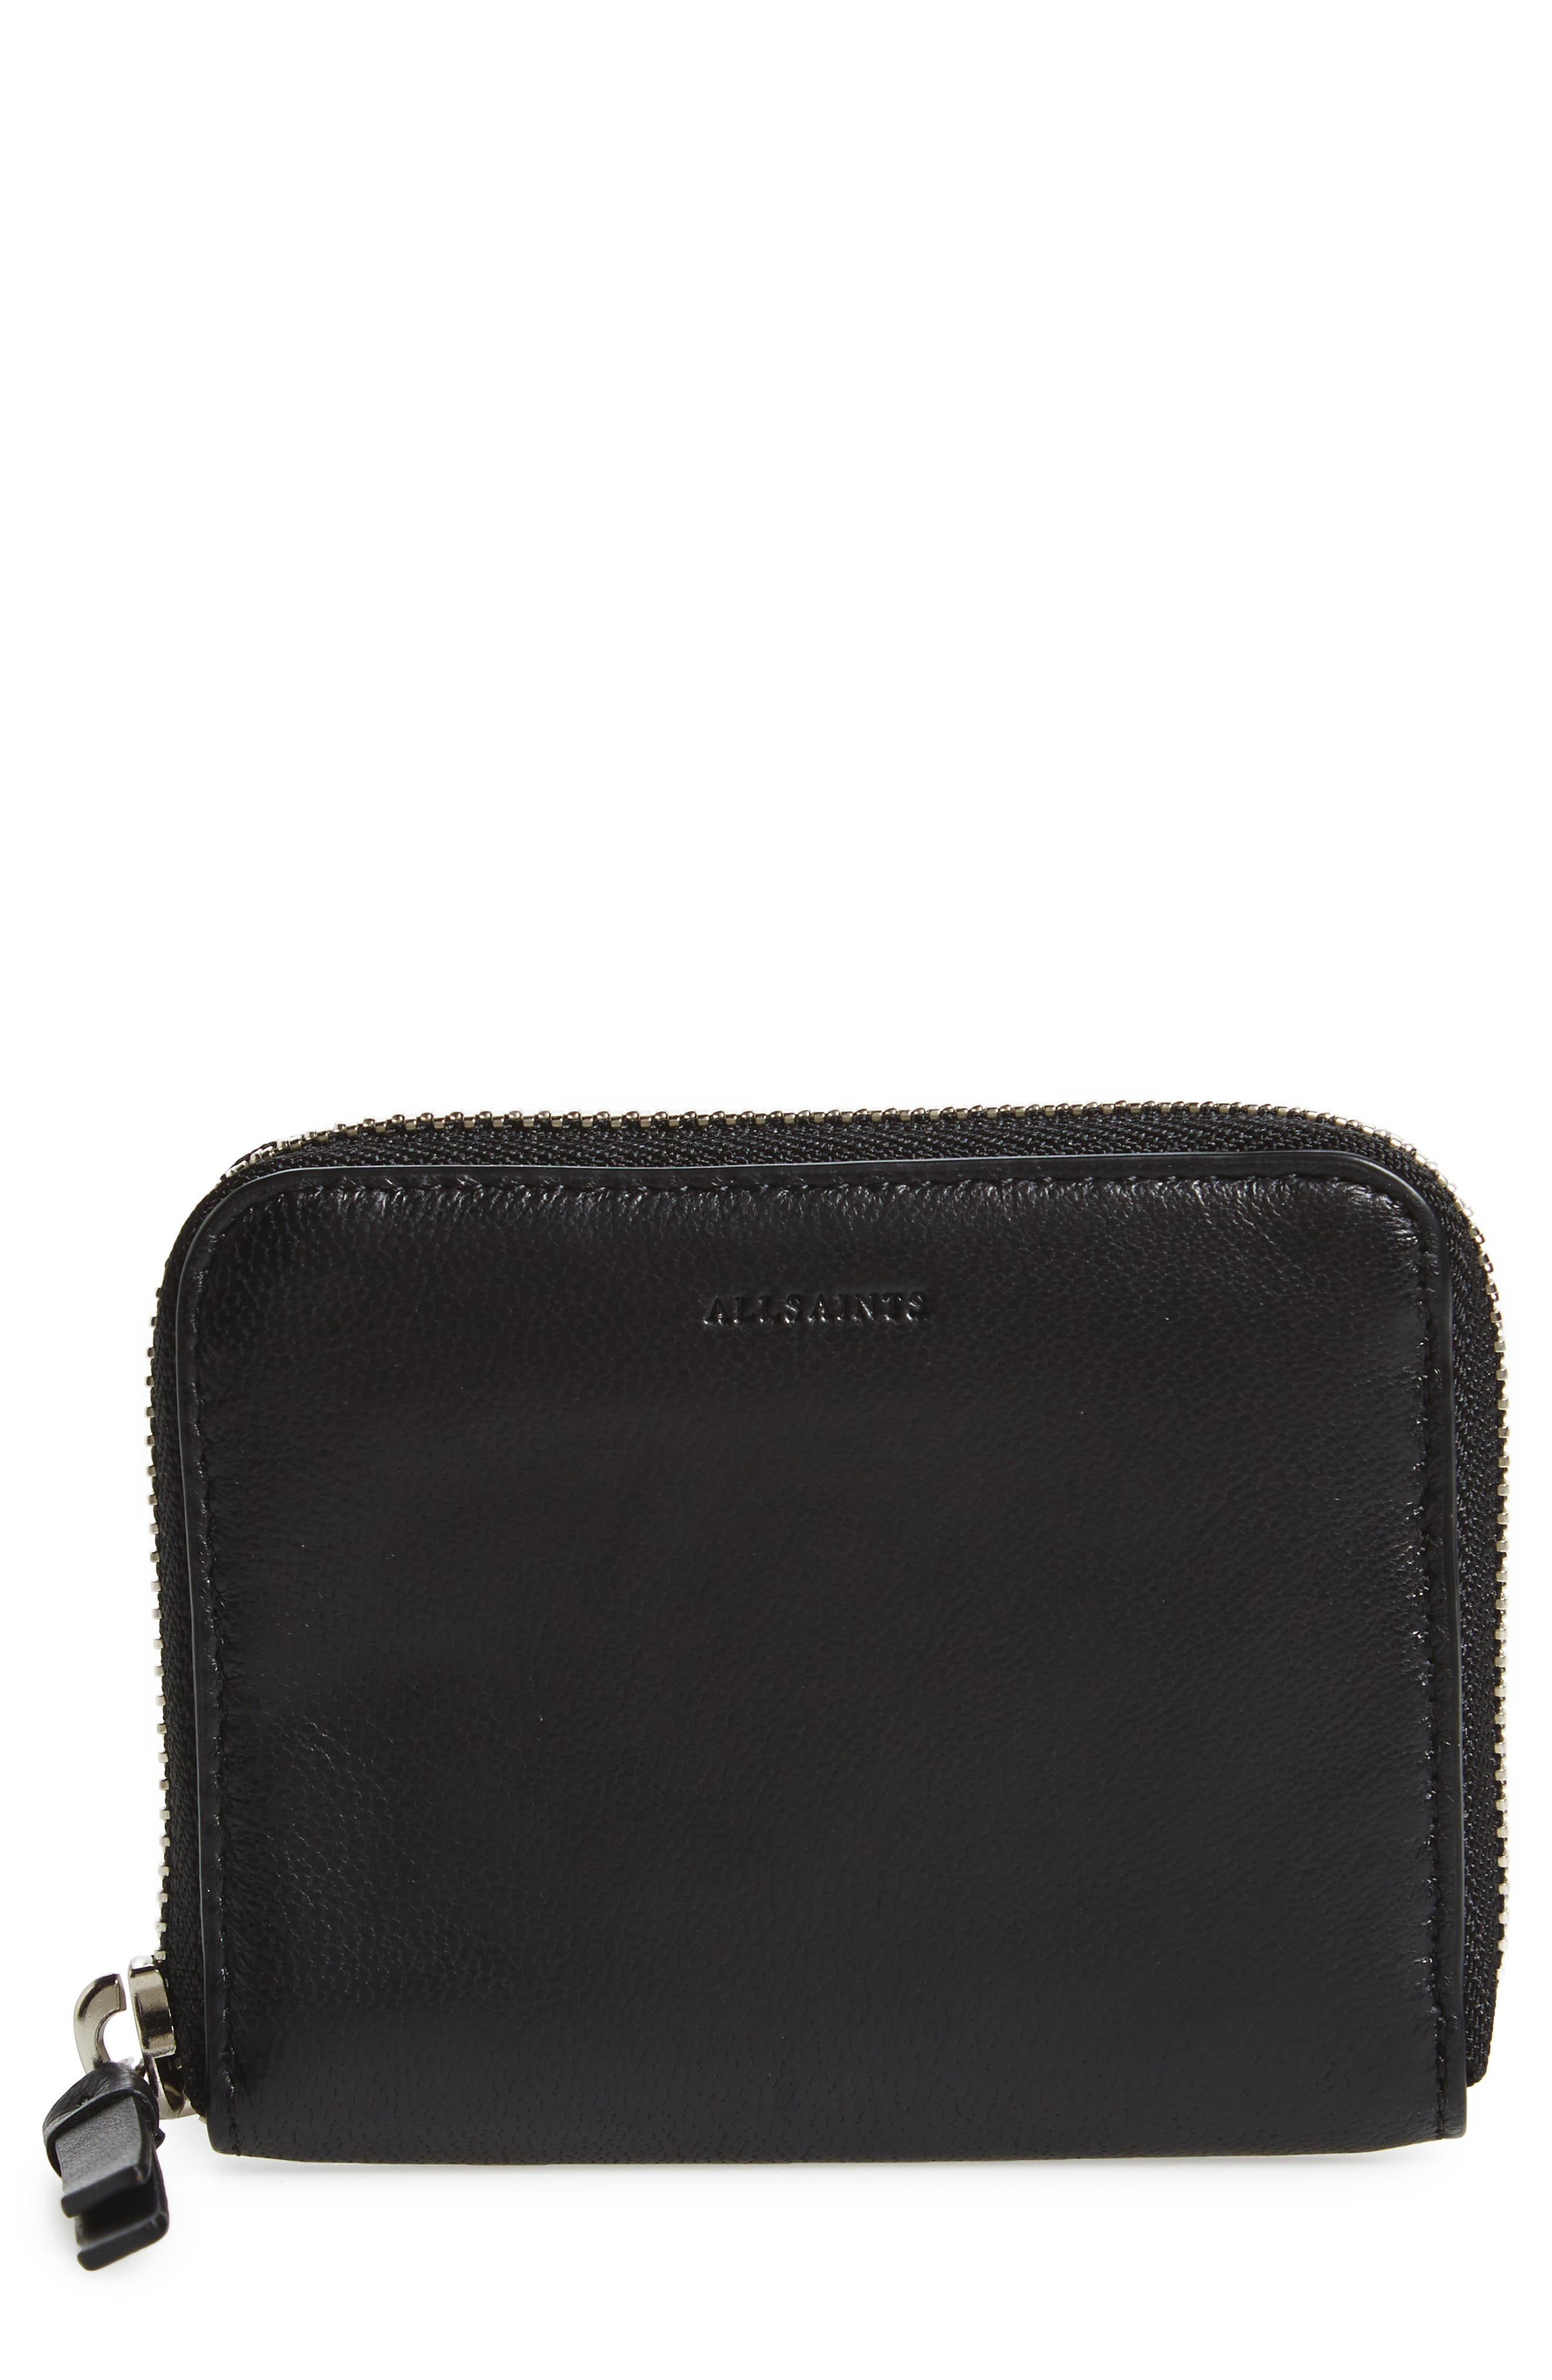 ALLSAINTS Kanda Mini Zip Wallet